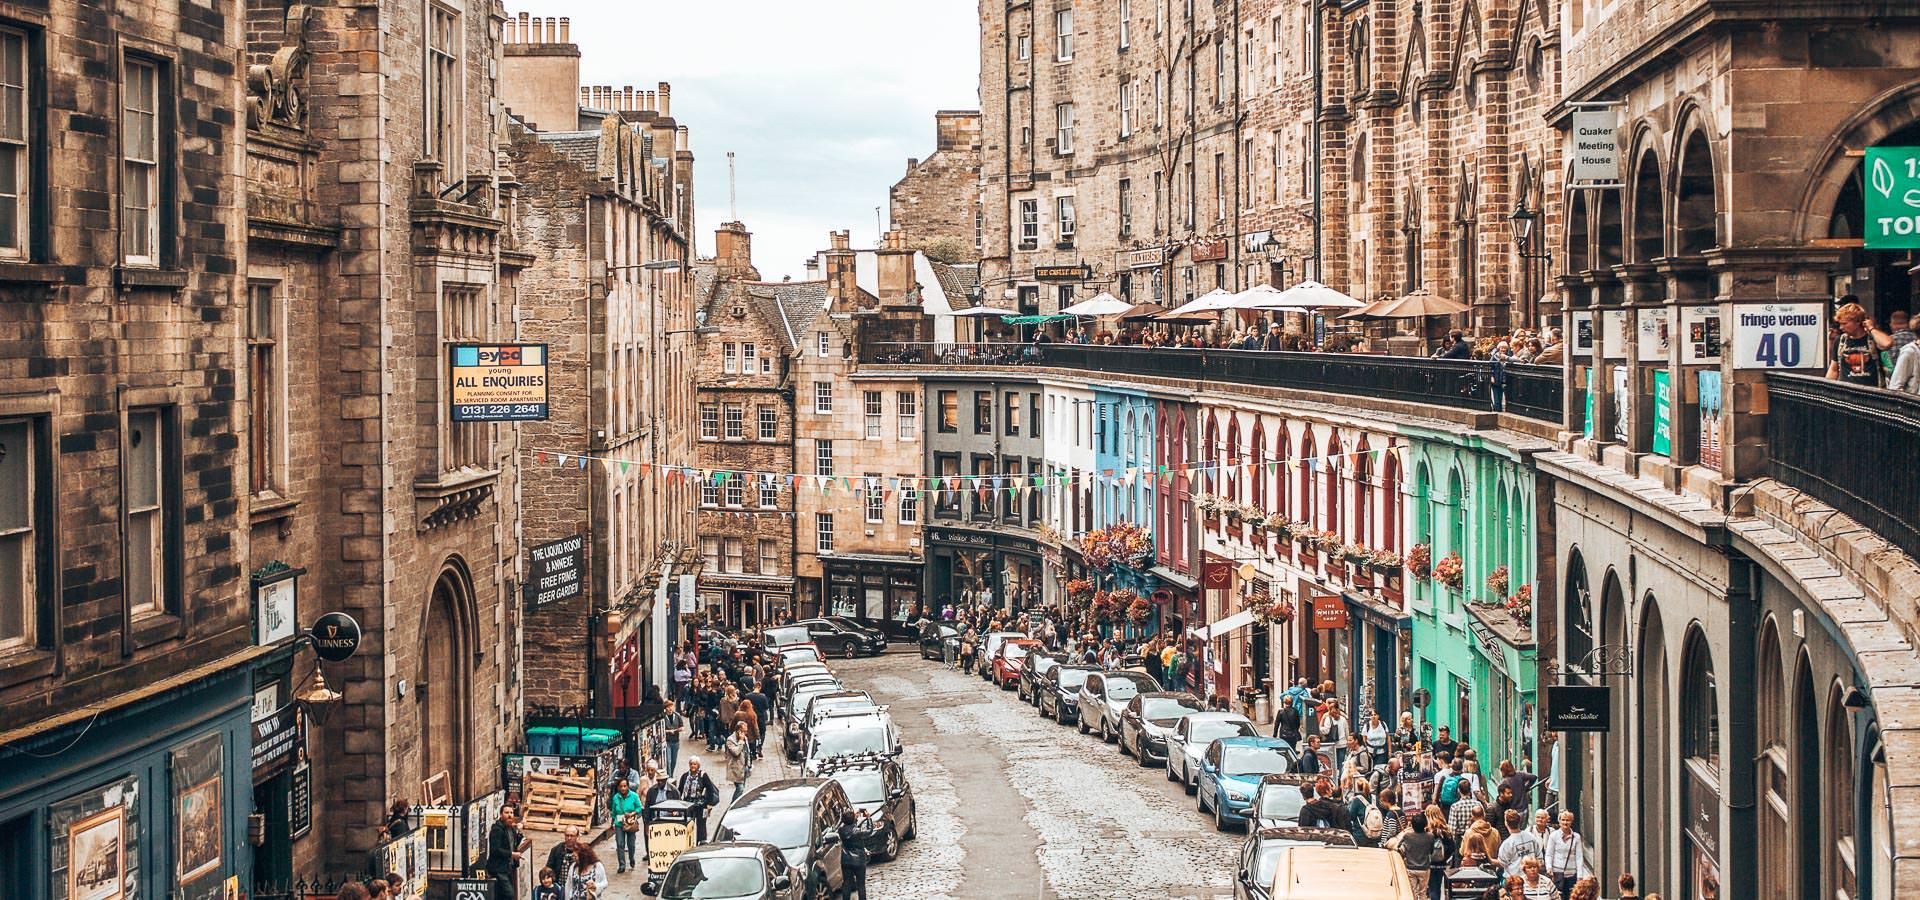 The Best 5 Specialty Coffee Shops in Edinburgh | best 5 specialty coffee shops in edinburgh 4